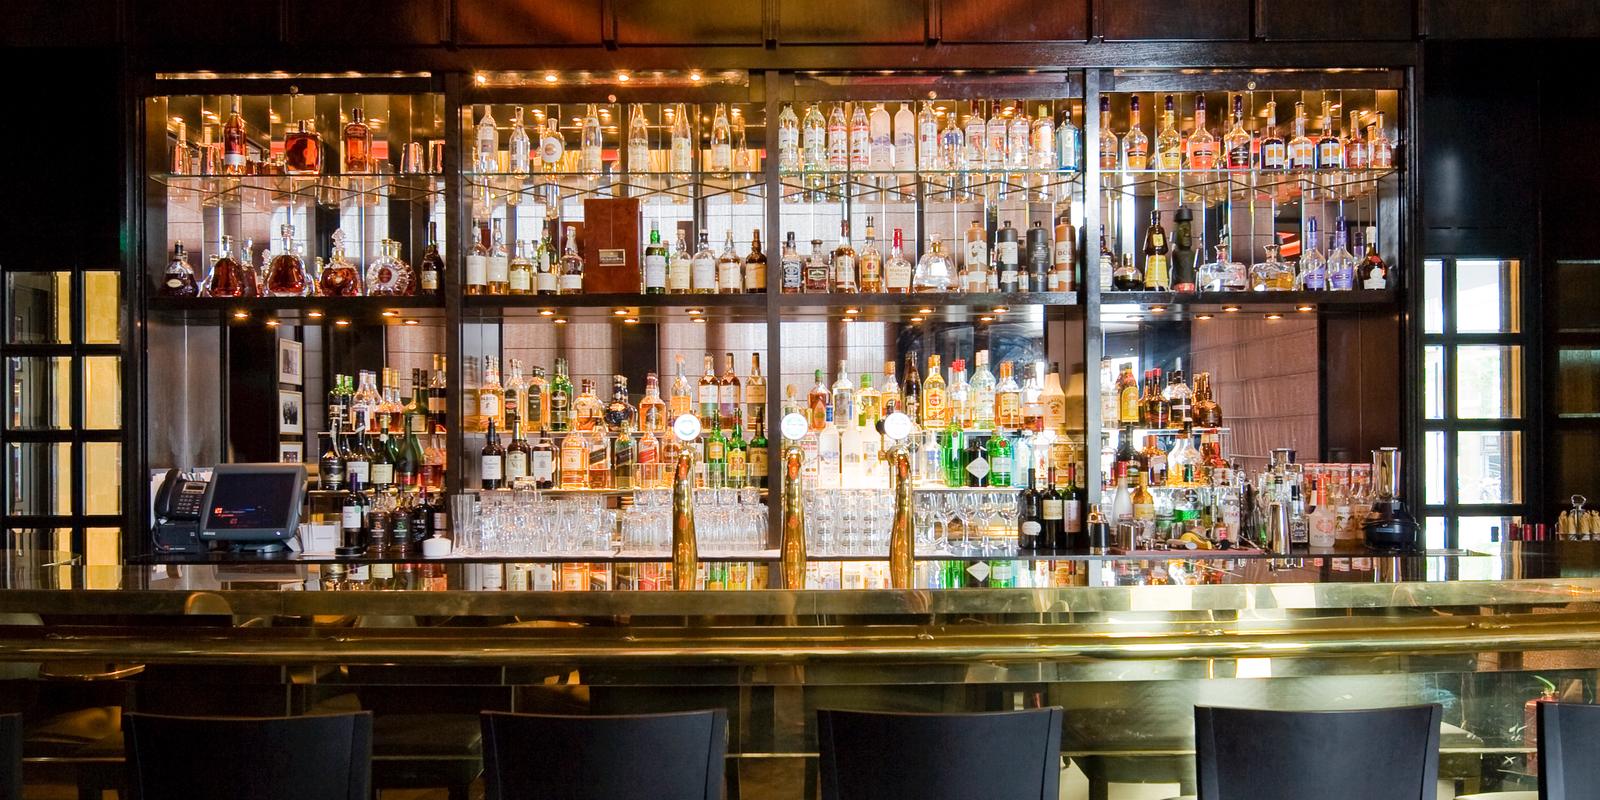 Glamourland Freddy's Bar l'Europe